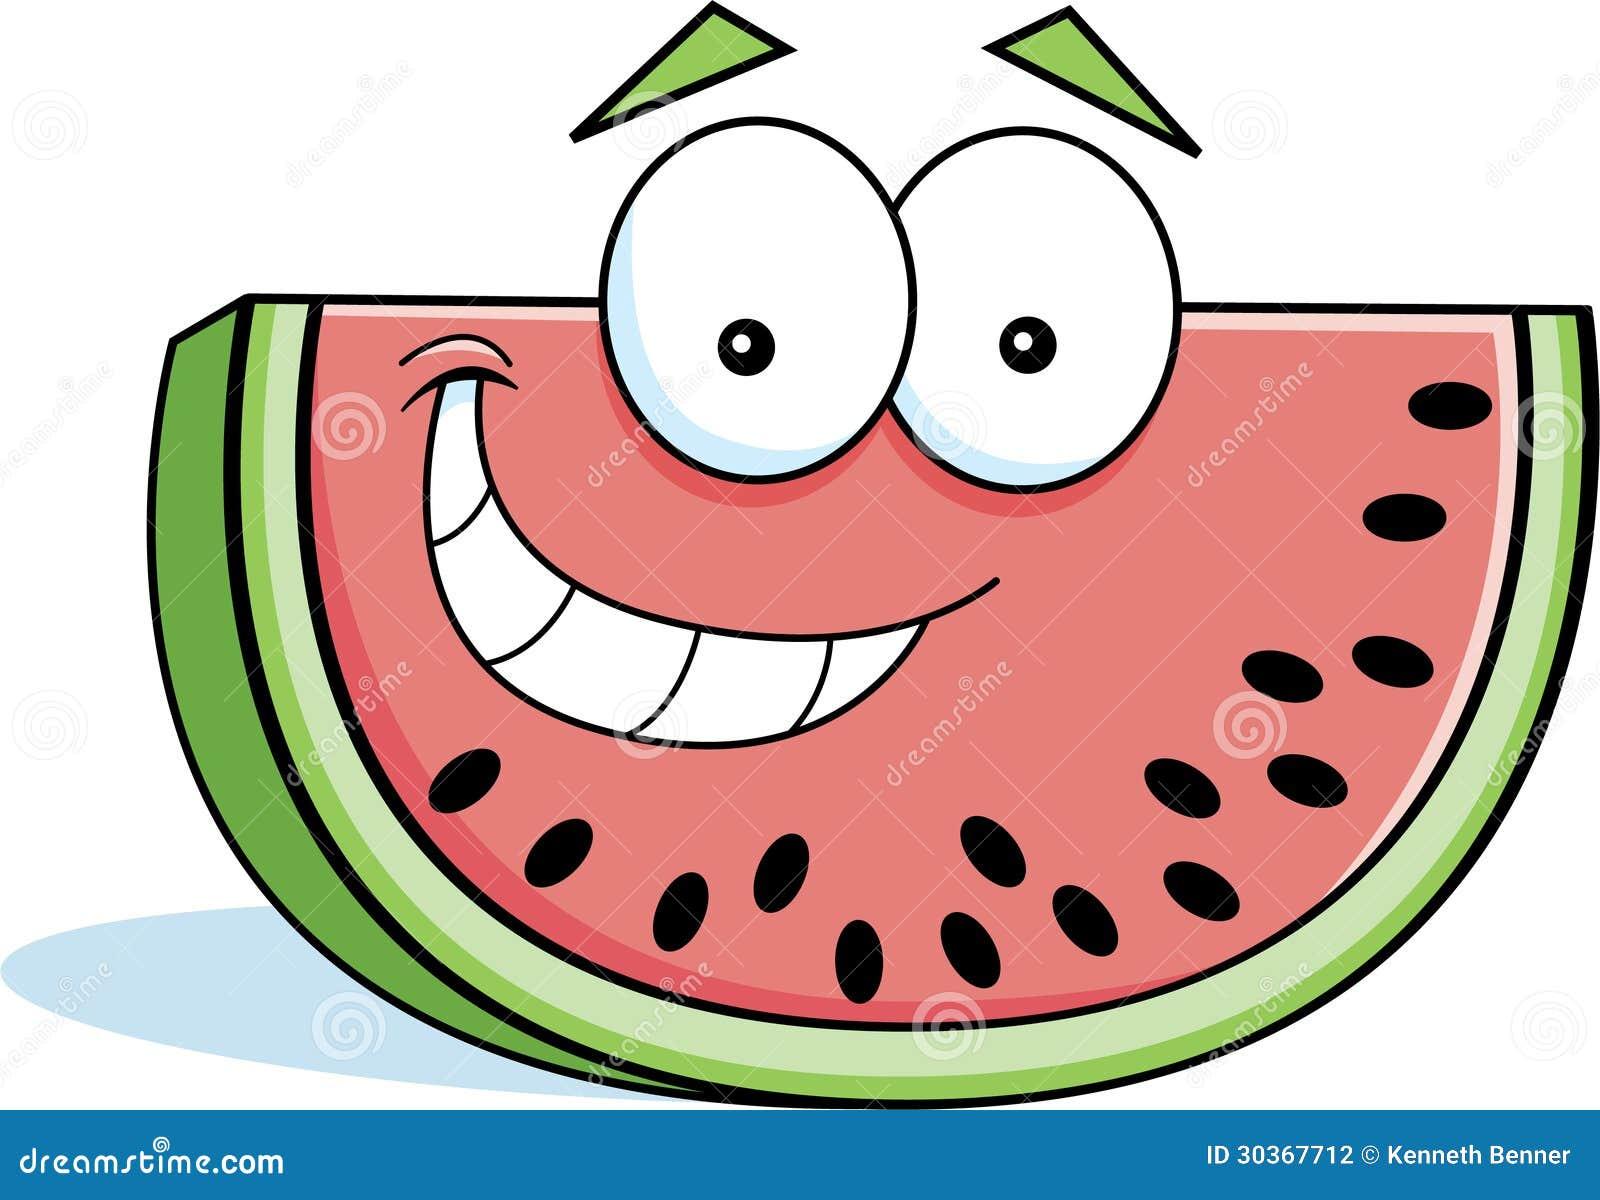 Watermelon Cartoon Images Cartoon watermelon